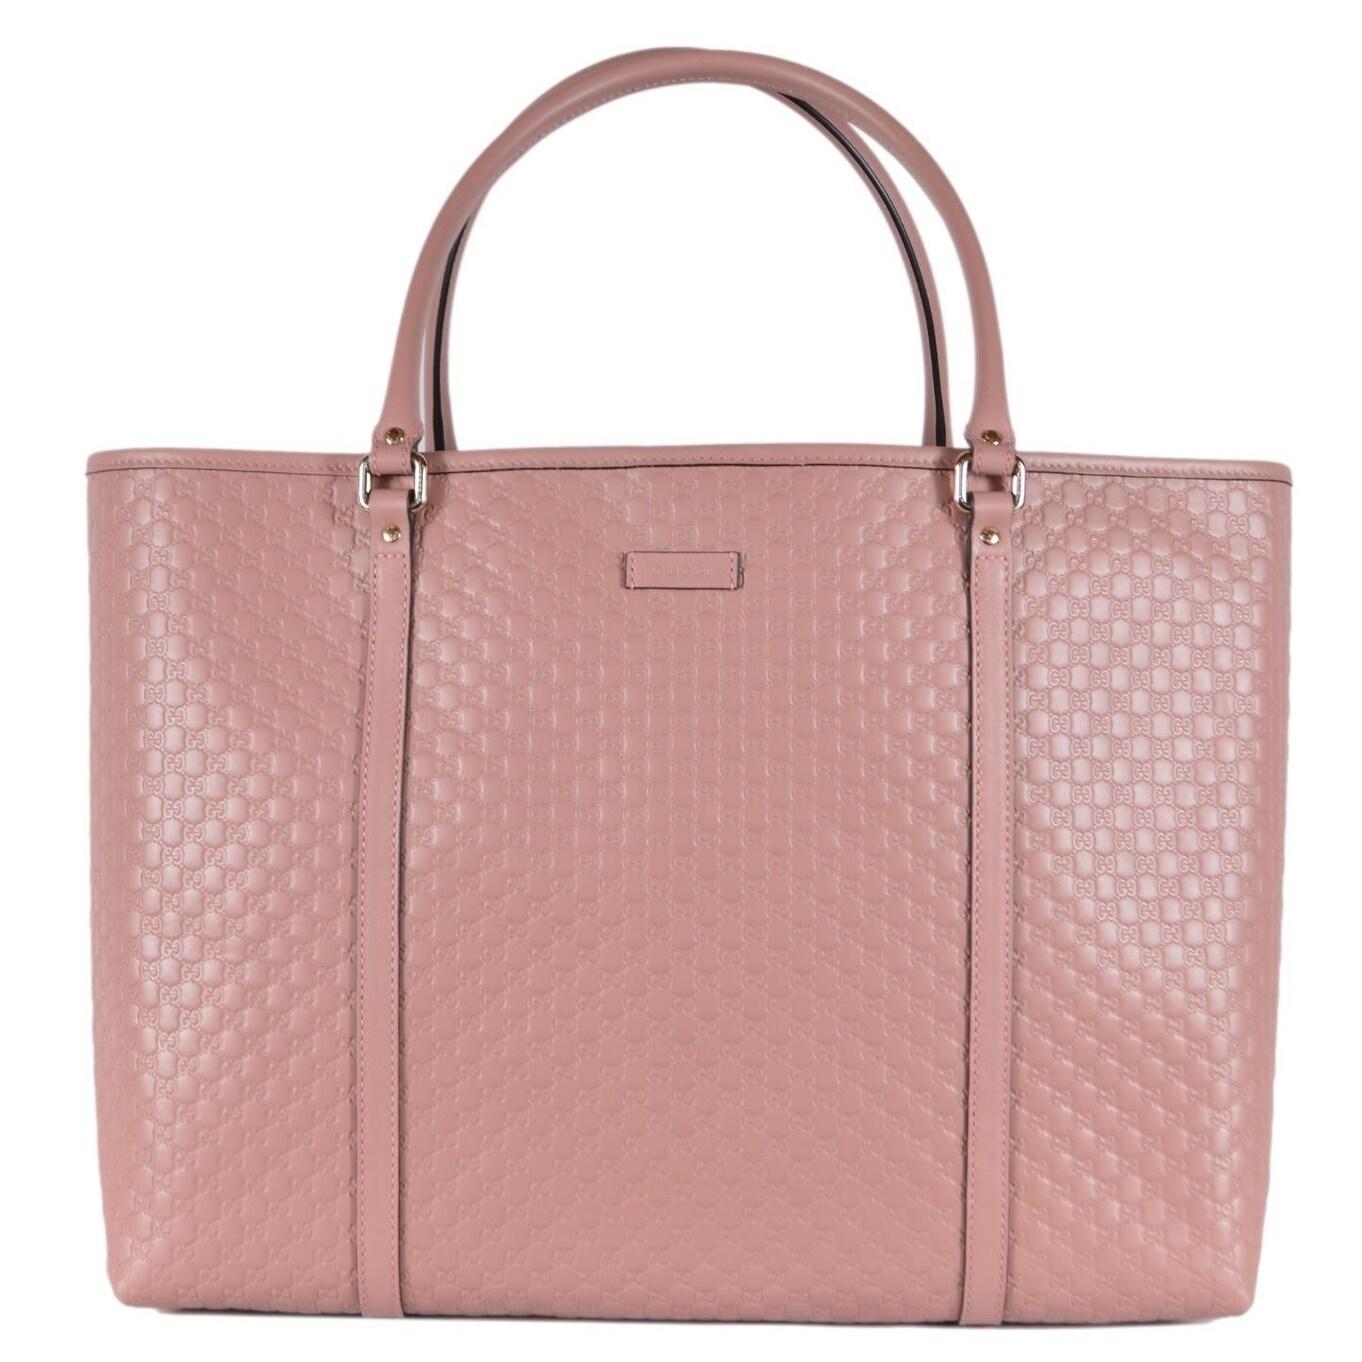 Gucci 449648 Large Pink Leather Micro Gg Guccissima Joy Bag Tote Purse